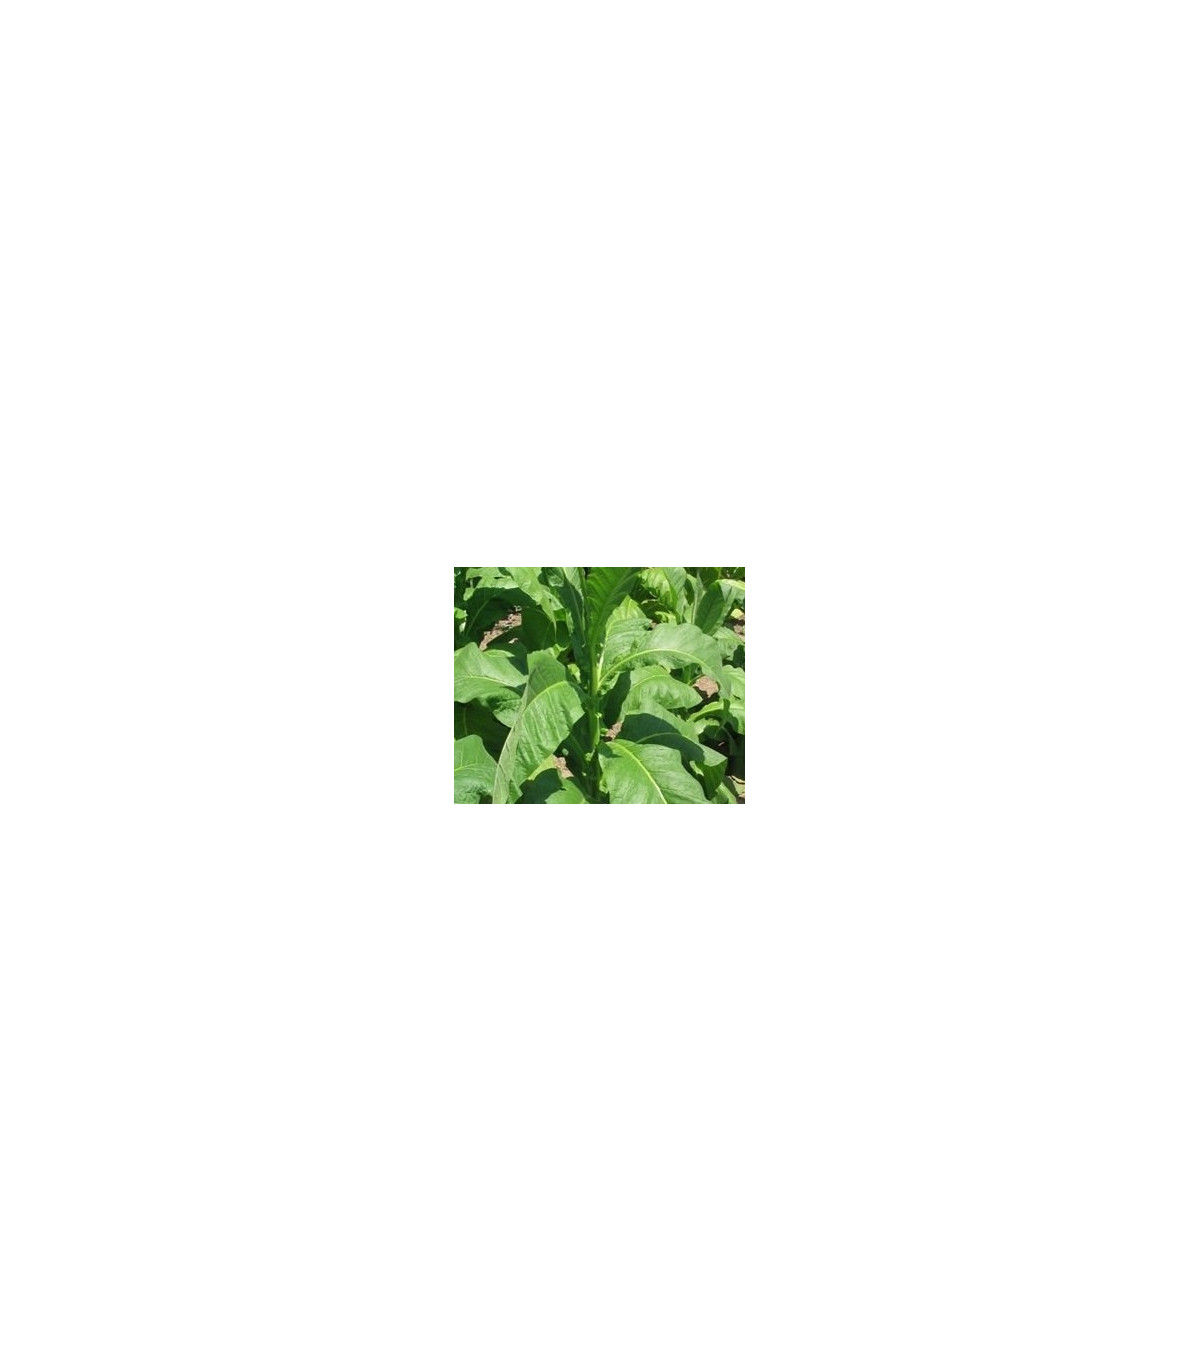 Tabak Hnedý List - Nicotiana tabacum - semená tabaku - 25 ks